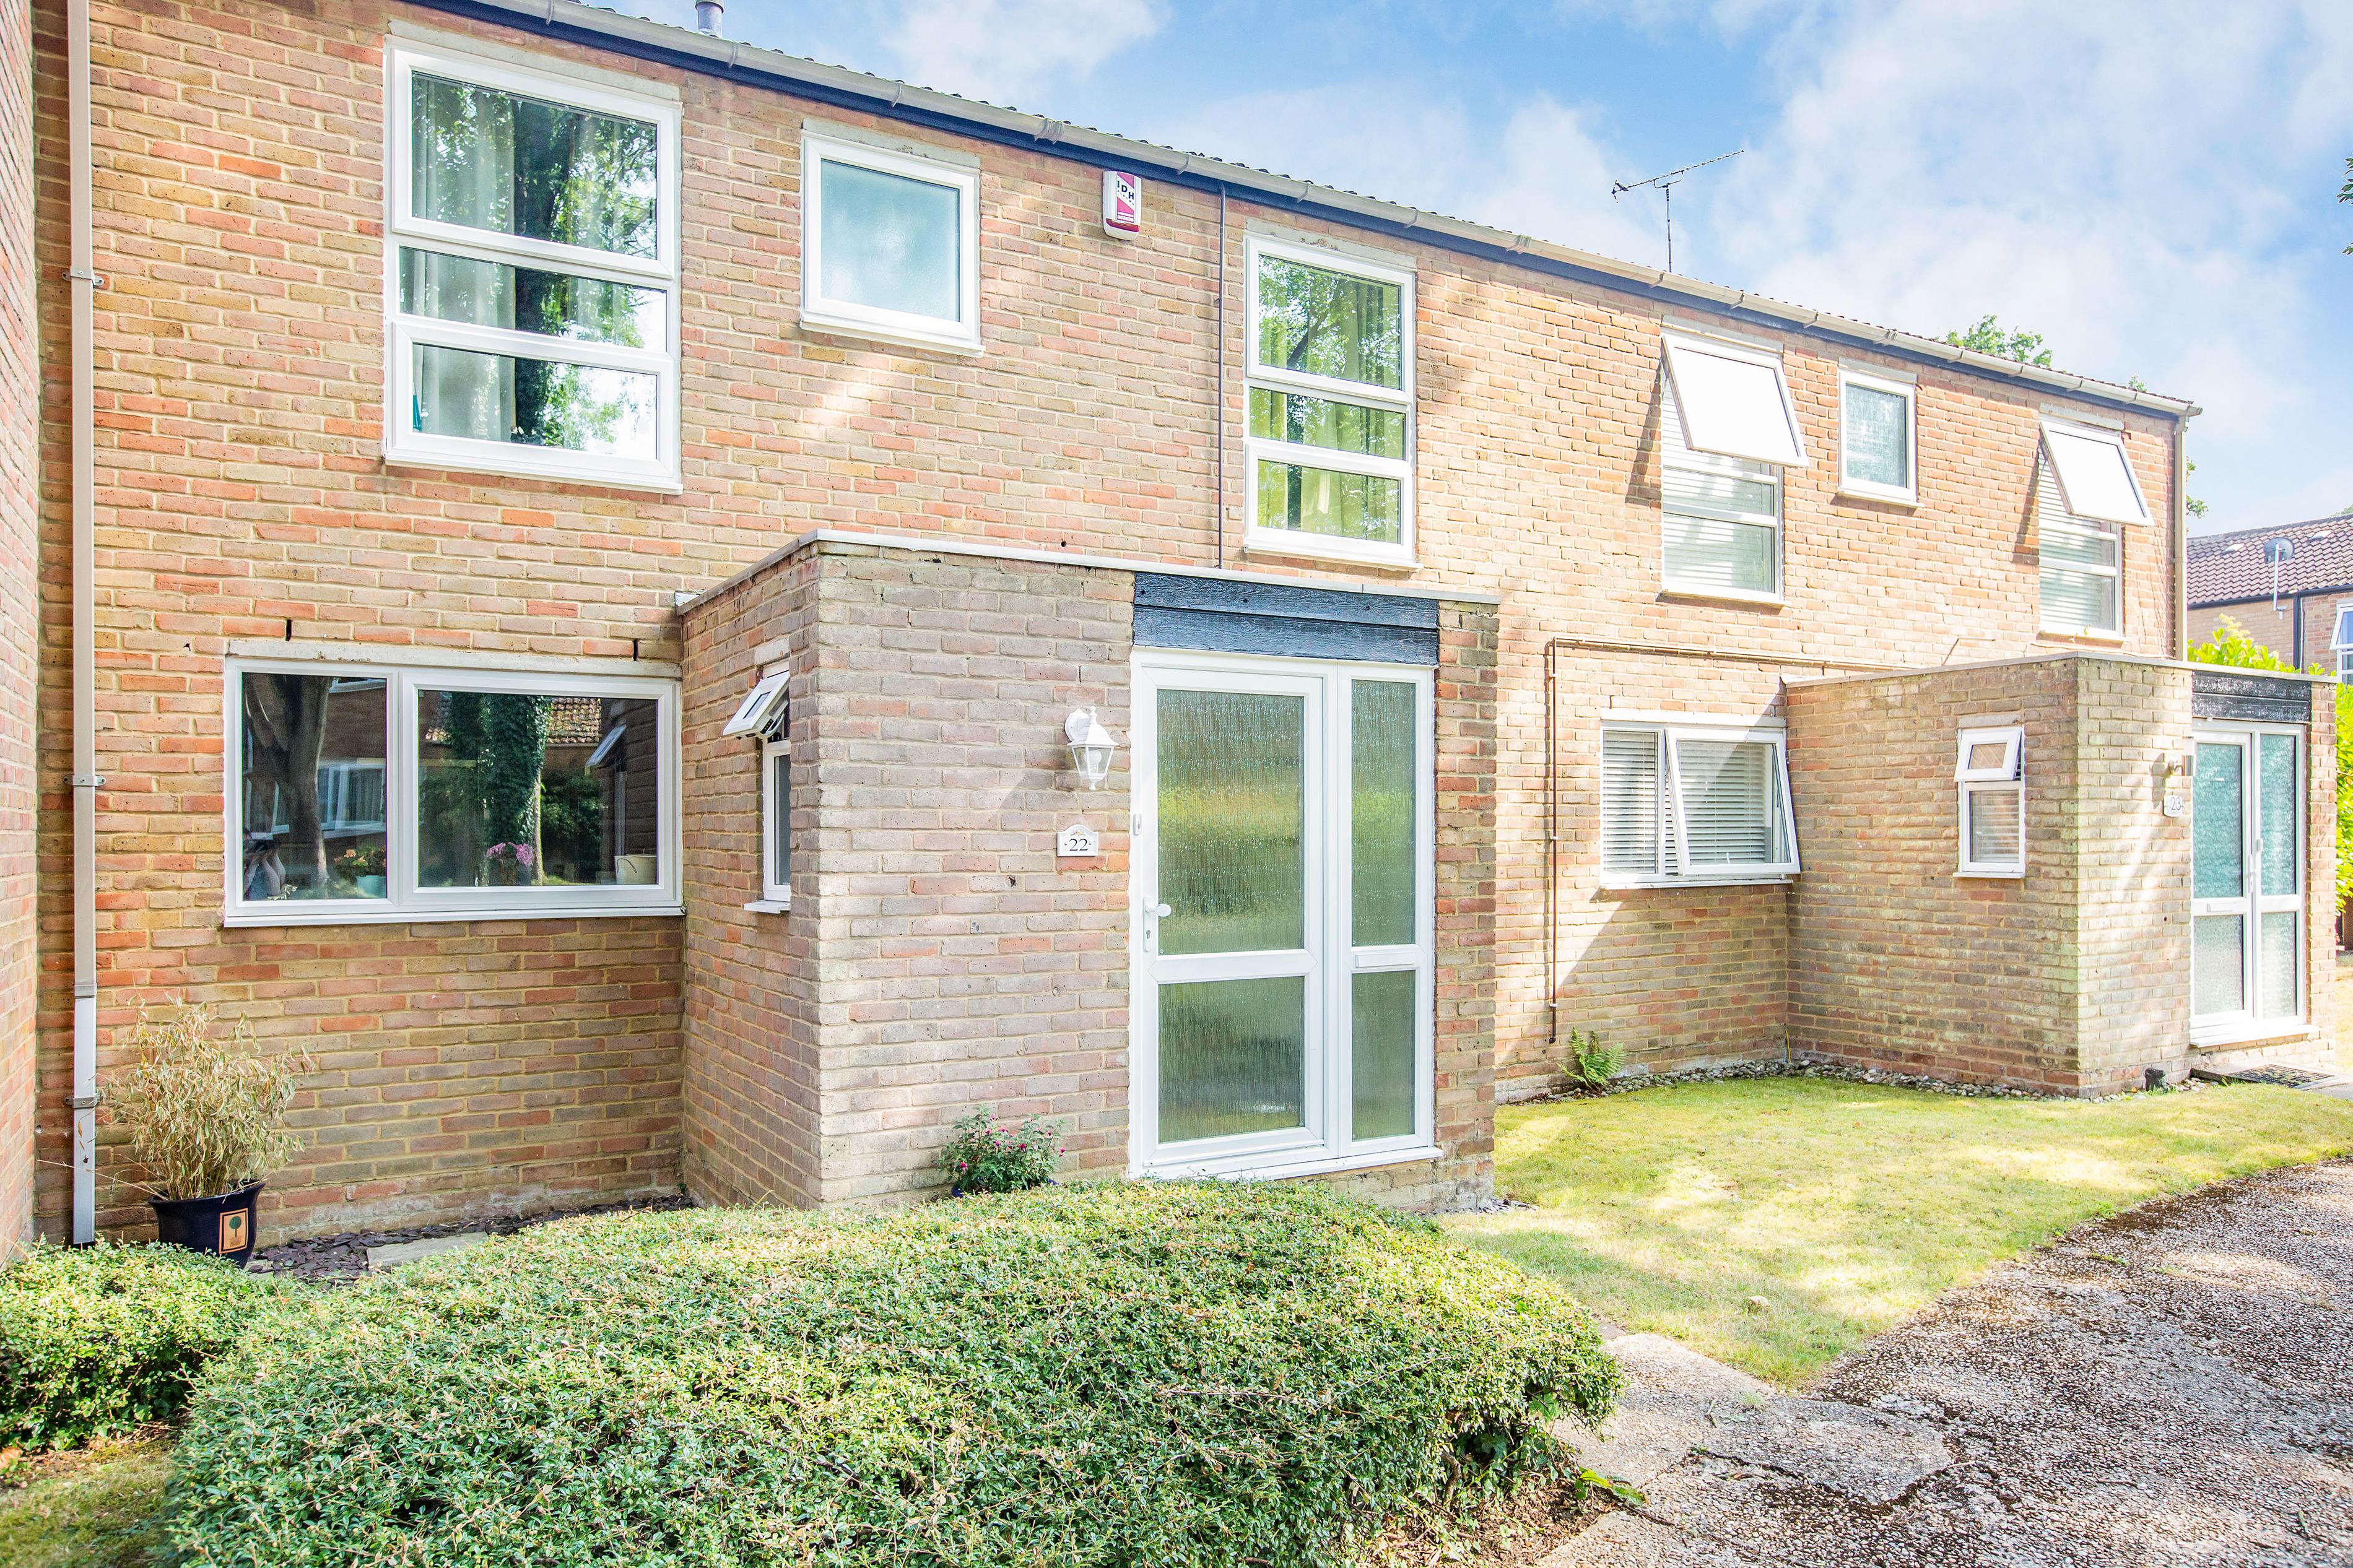 New Ash Green - £410,000